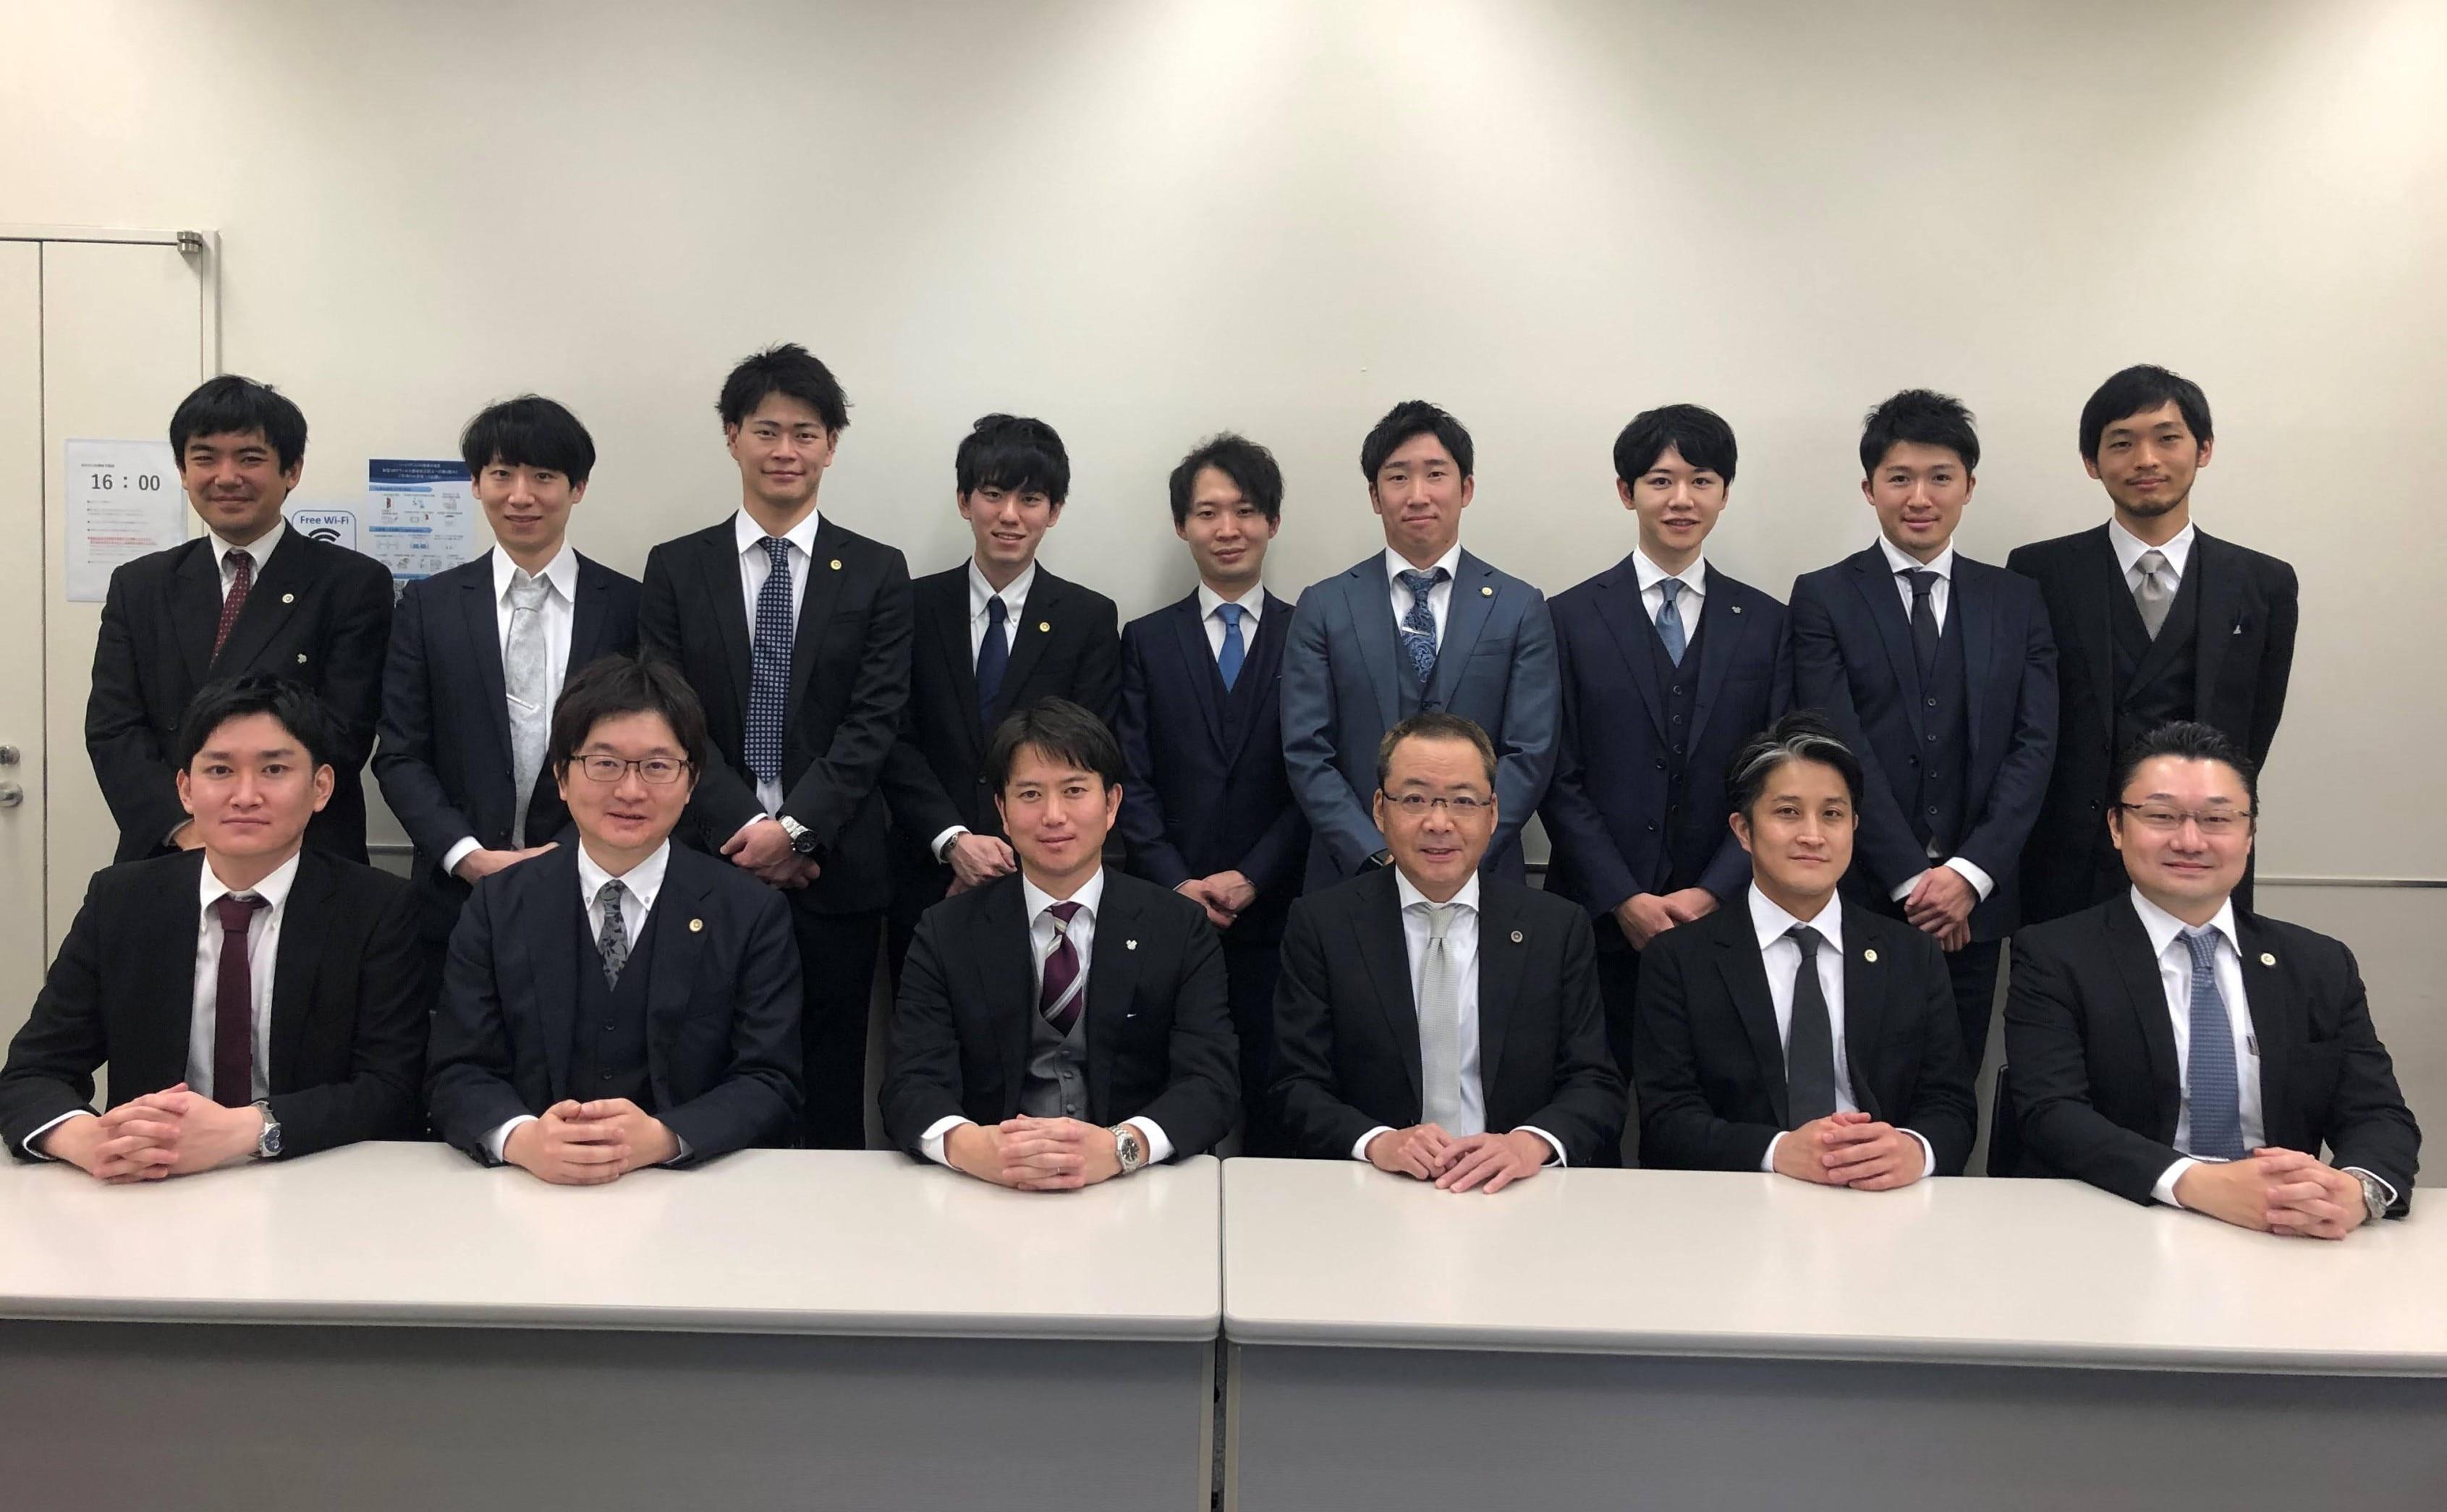 弁護士法人サリュ神戸事務所